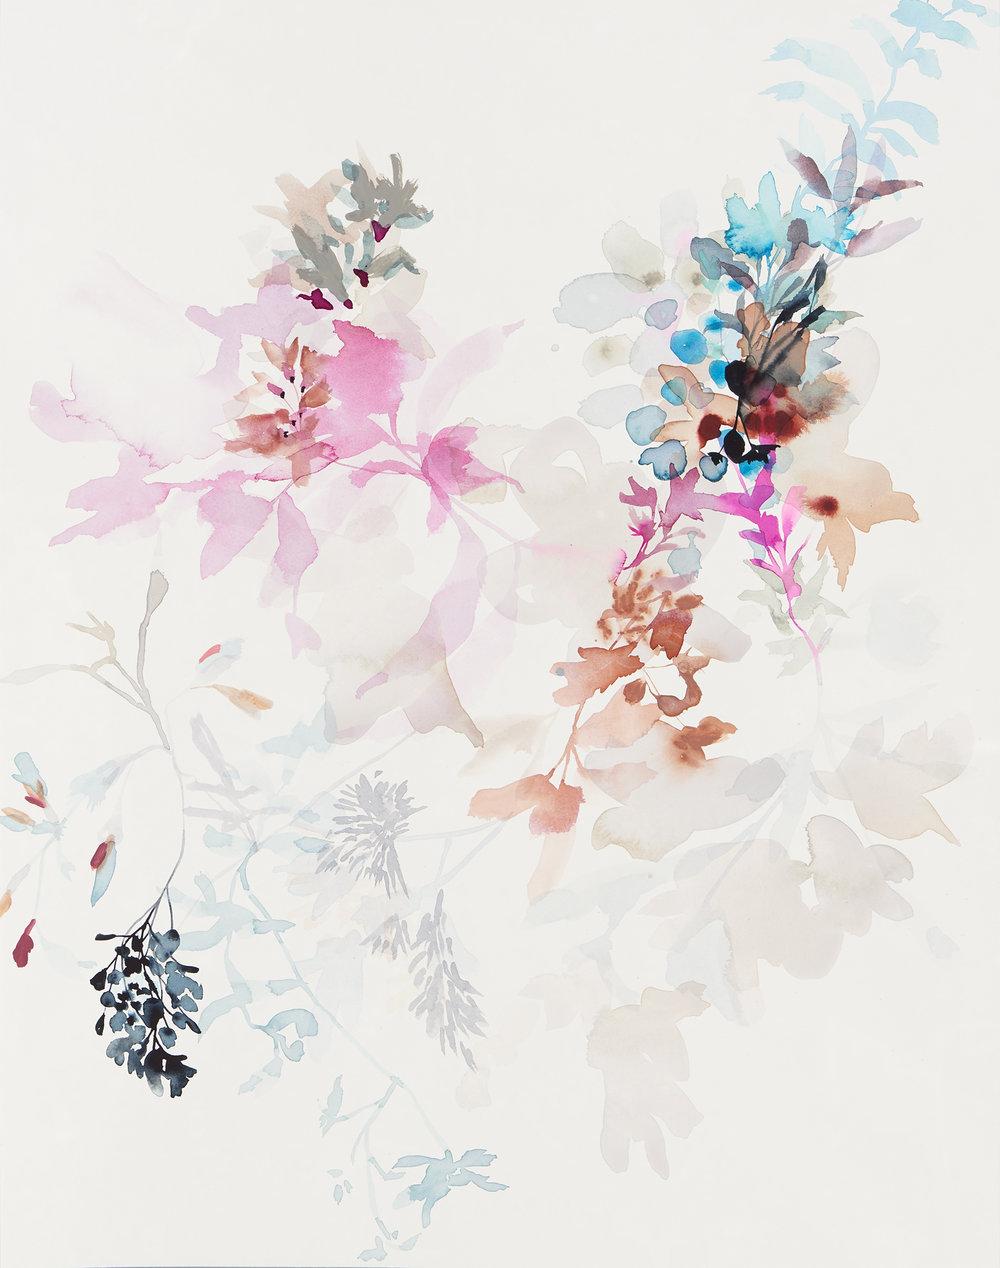 Wildflower Study - stilllife - 1, 2018, mixed media on paper, 28 x 22.jpg